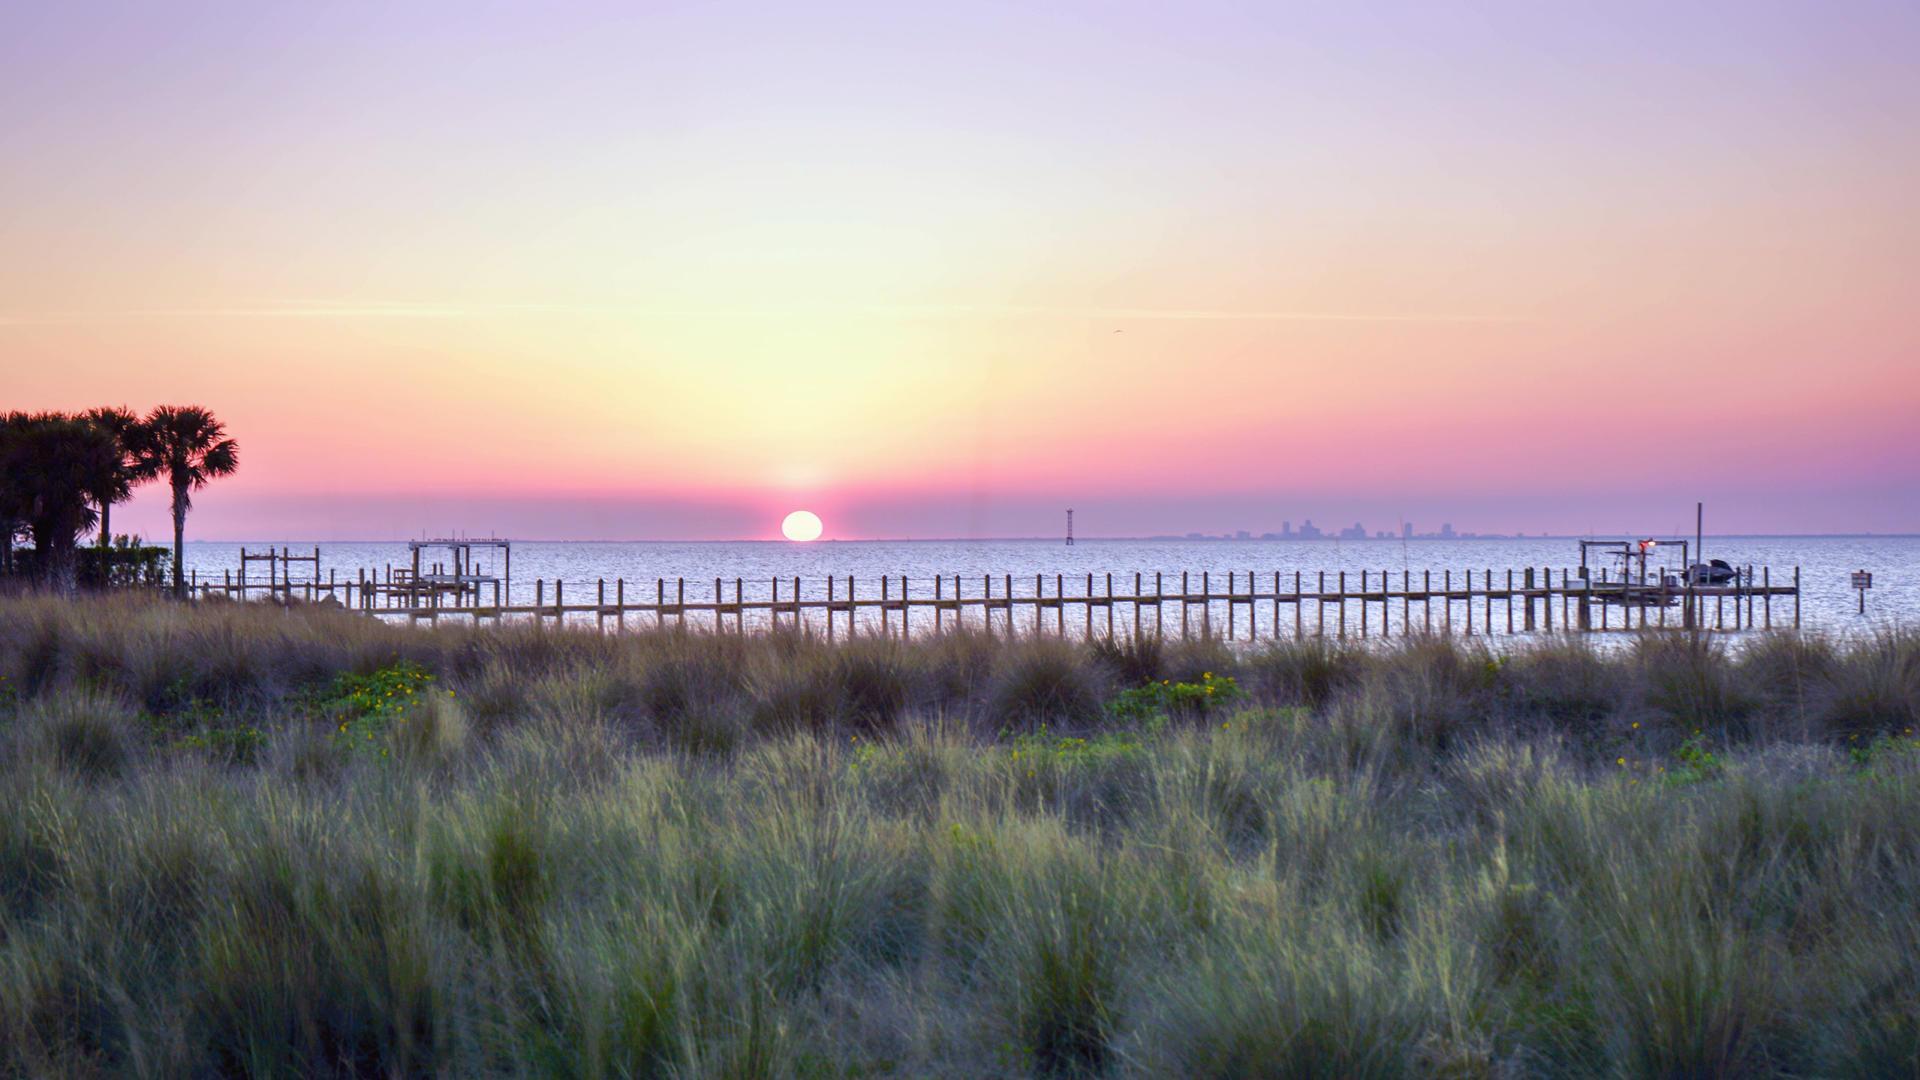 'Palm Coast' by MARONDA - JACKSONVILLE SOUTH in Daytona Beach